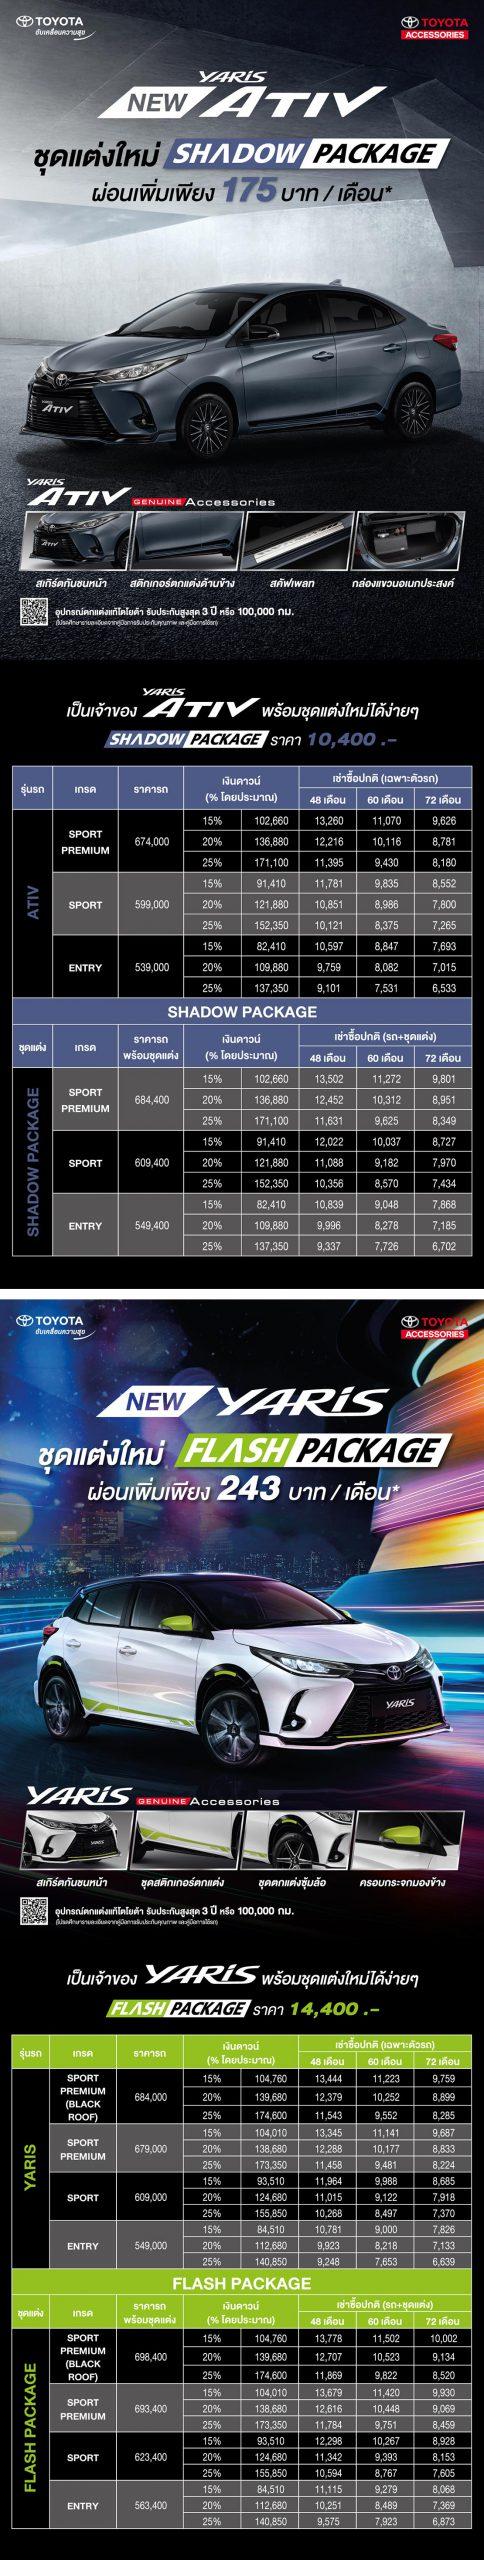 20200824144226-scaled โปรโมชั่นชุดแต่ง NEW ATIV | NEW Yaris